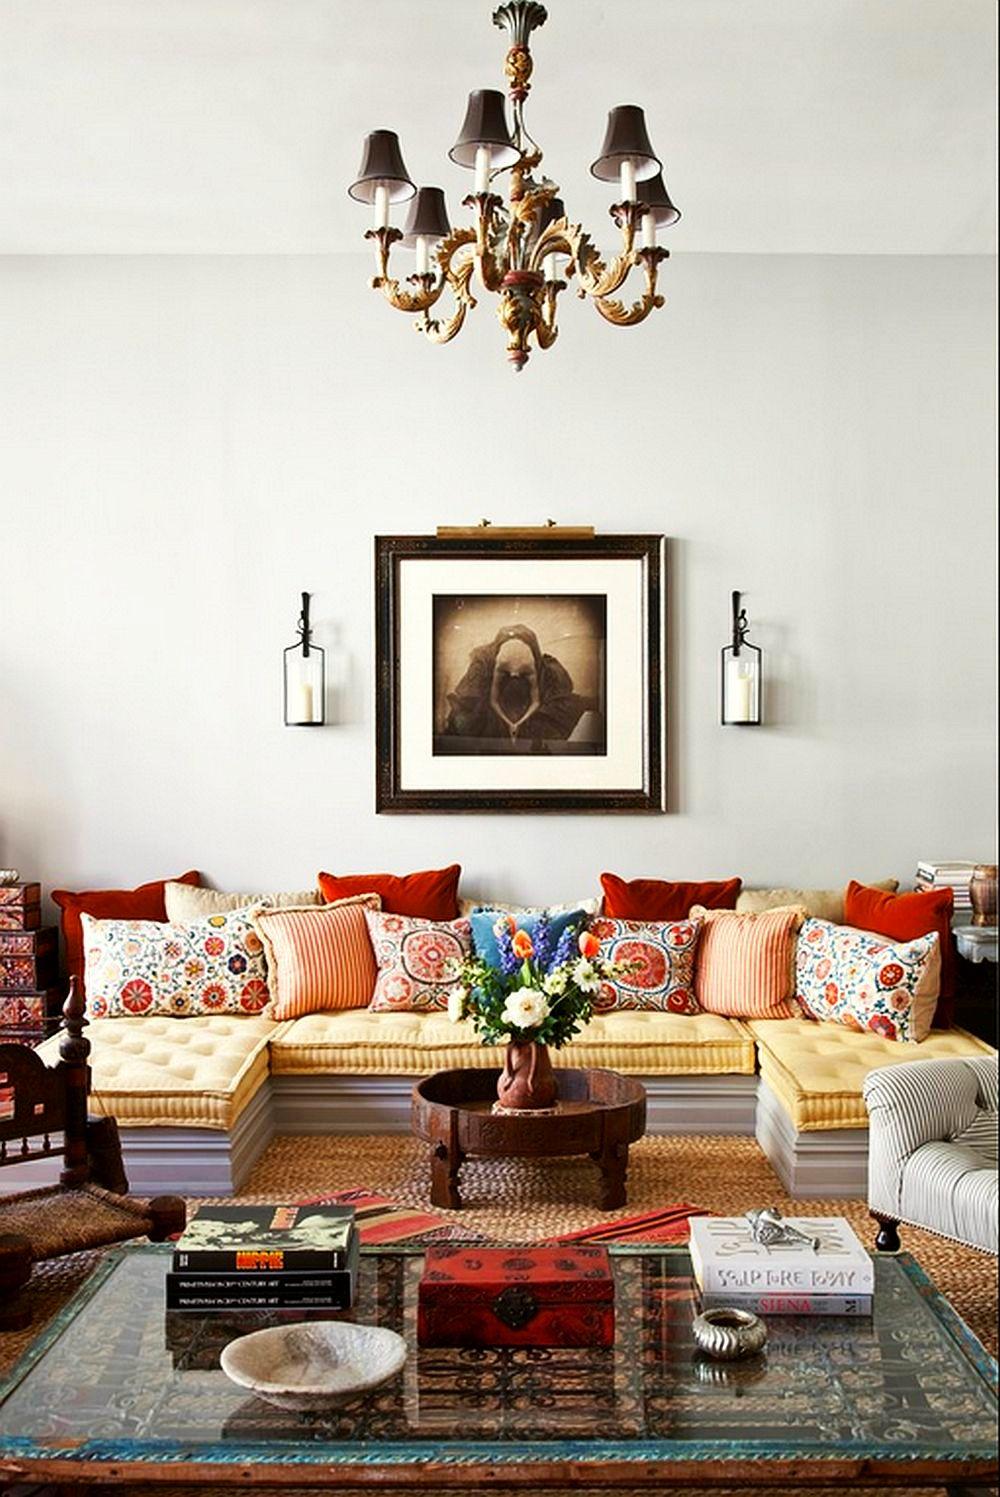 adelaparvu.com despre loft in stil eclectic cu influente marocane, morrocan style, designer Deborah French, Foto Yiorgos Kordakis (1)